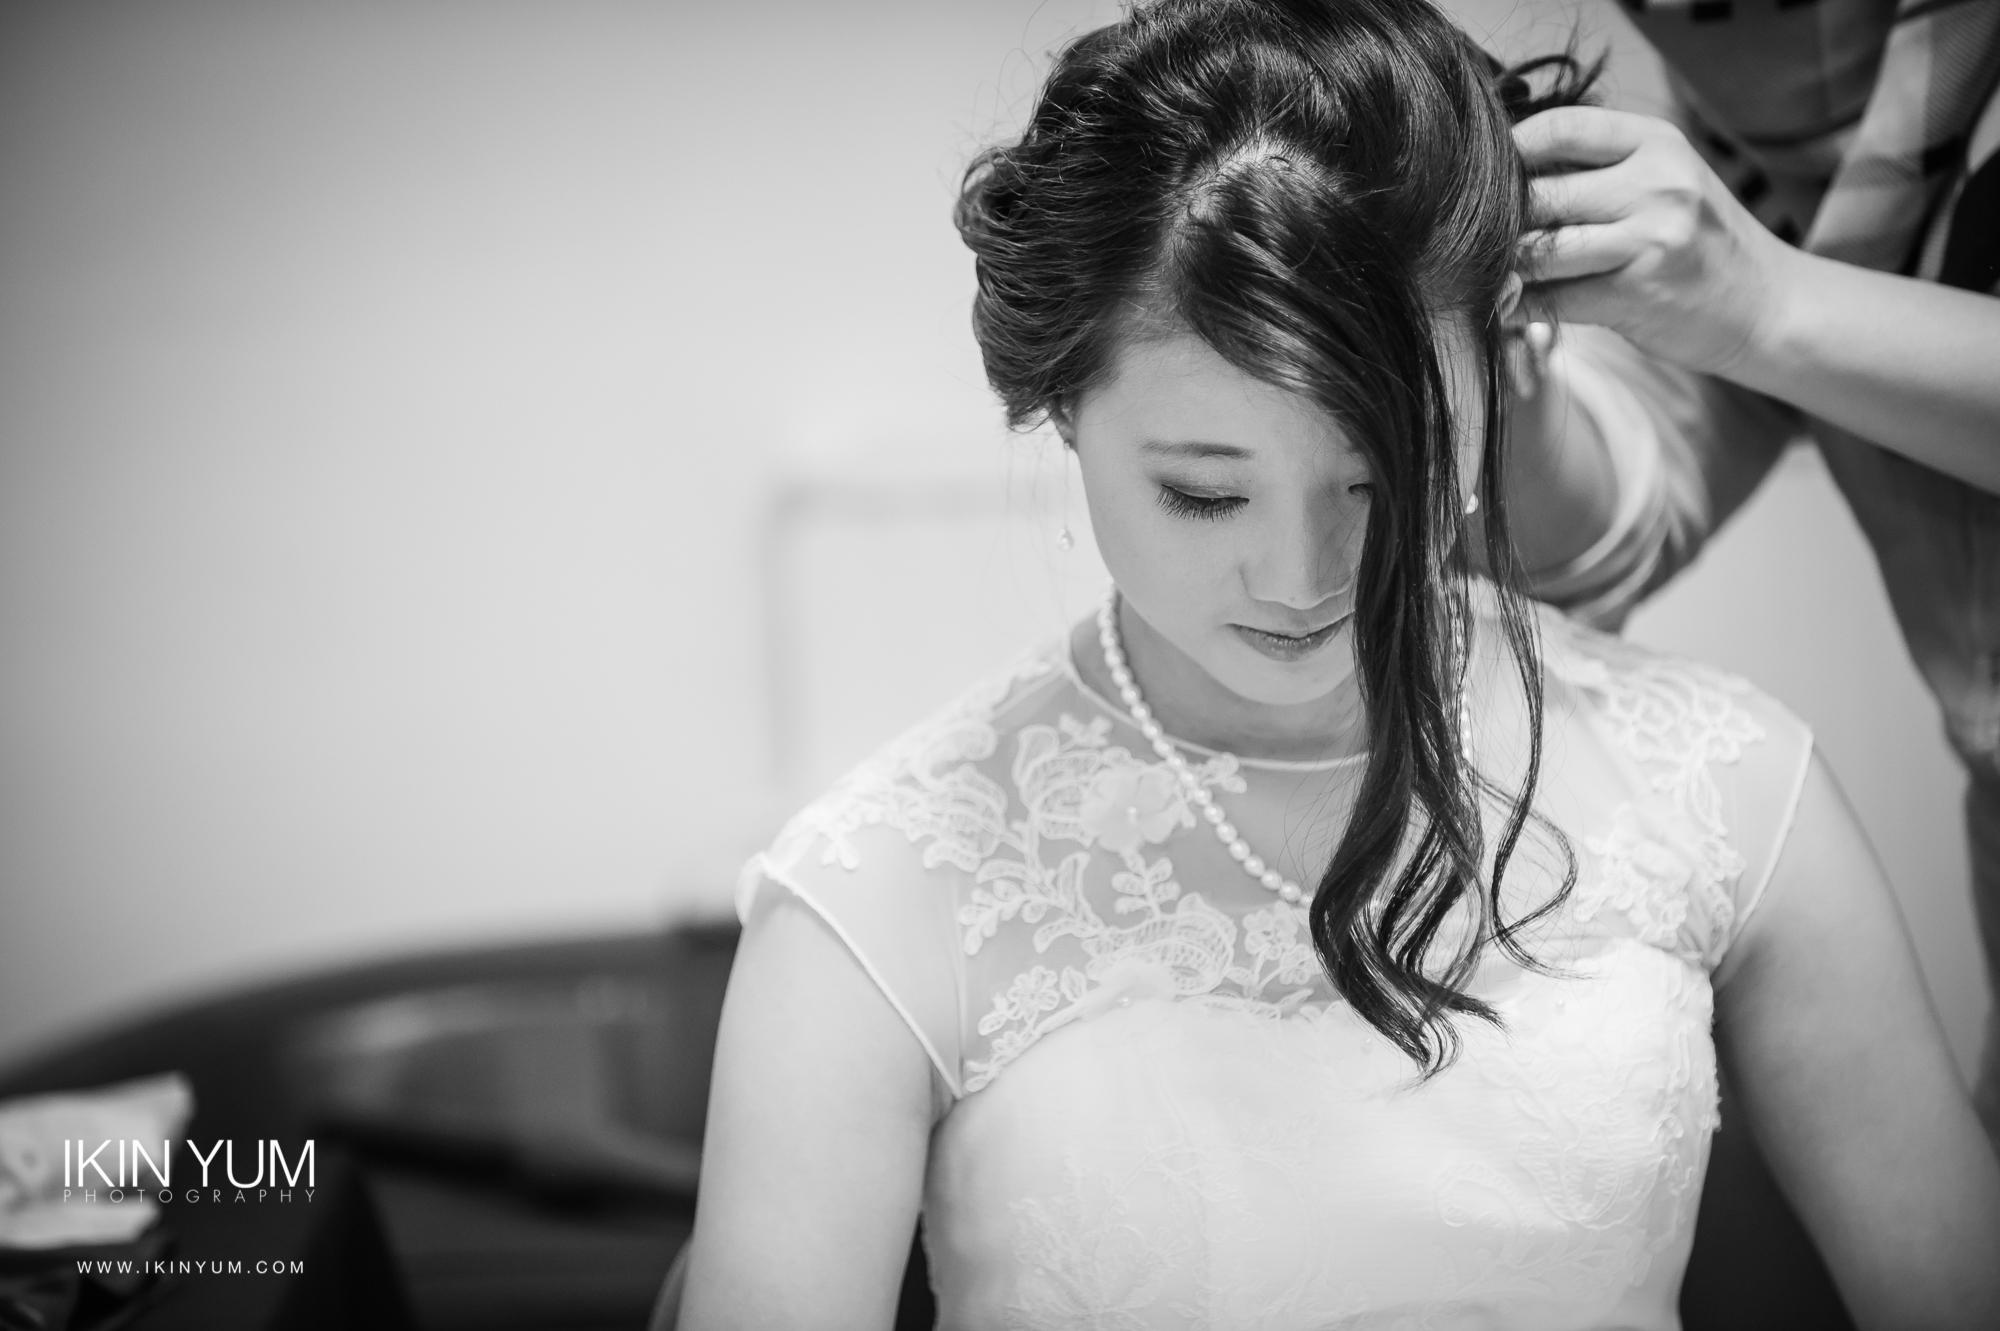 Mermaid river rooms Wedding - Ikin Yum Photography-036.jpg